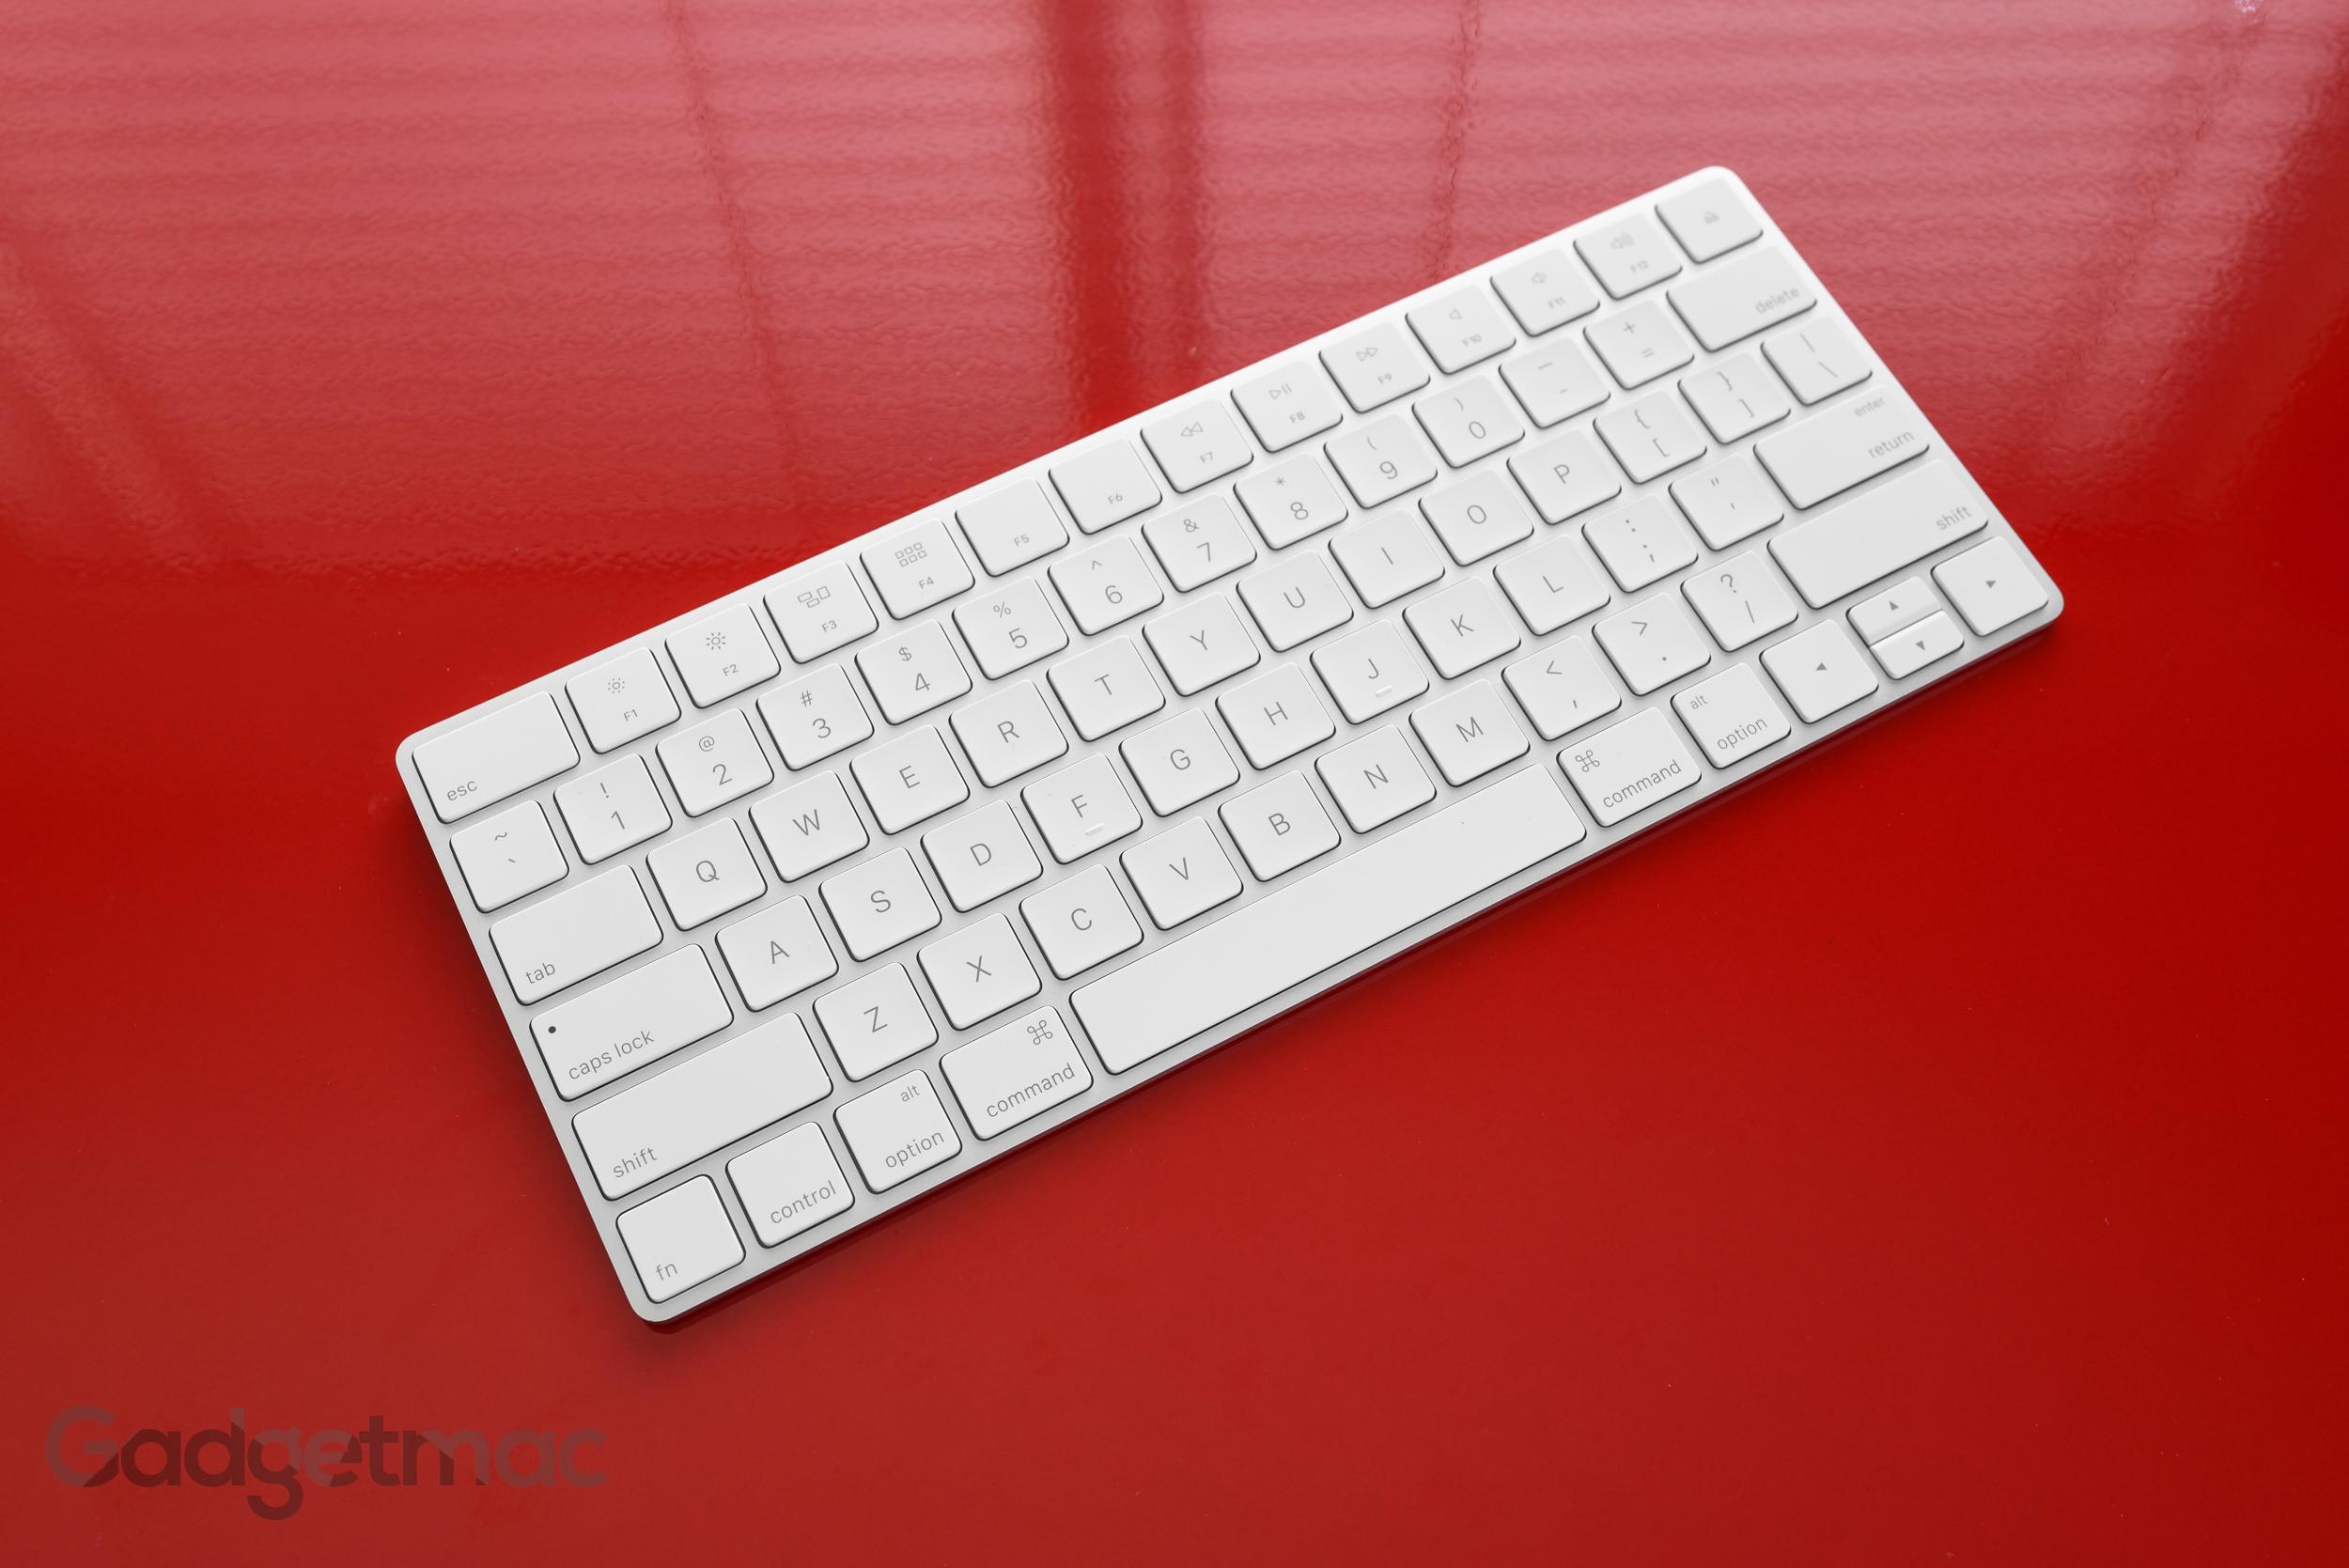 apple-rechargeable-magic-keyboard-wireless-bluetooth-4.jpg